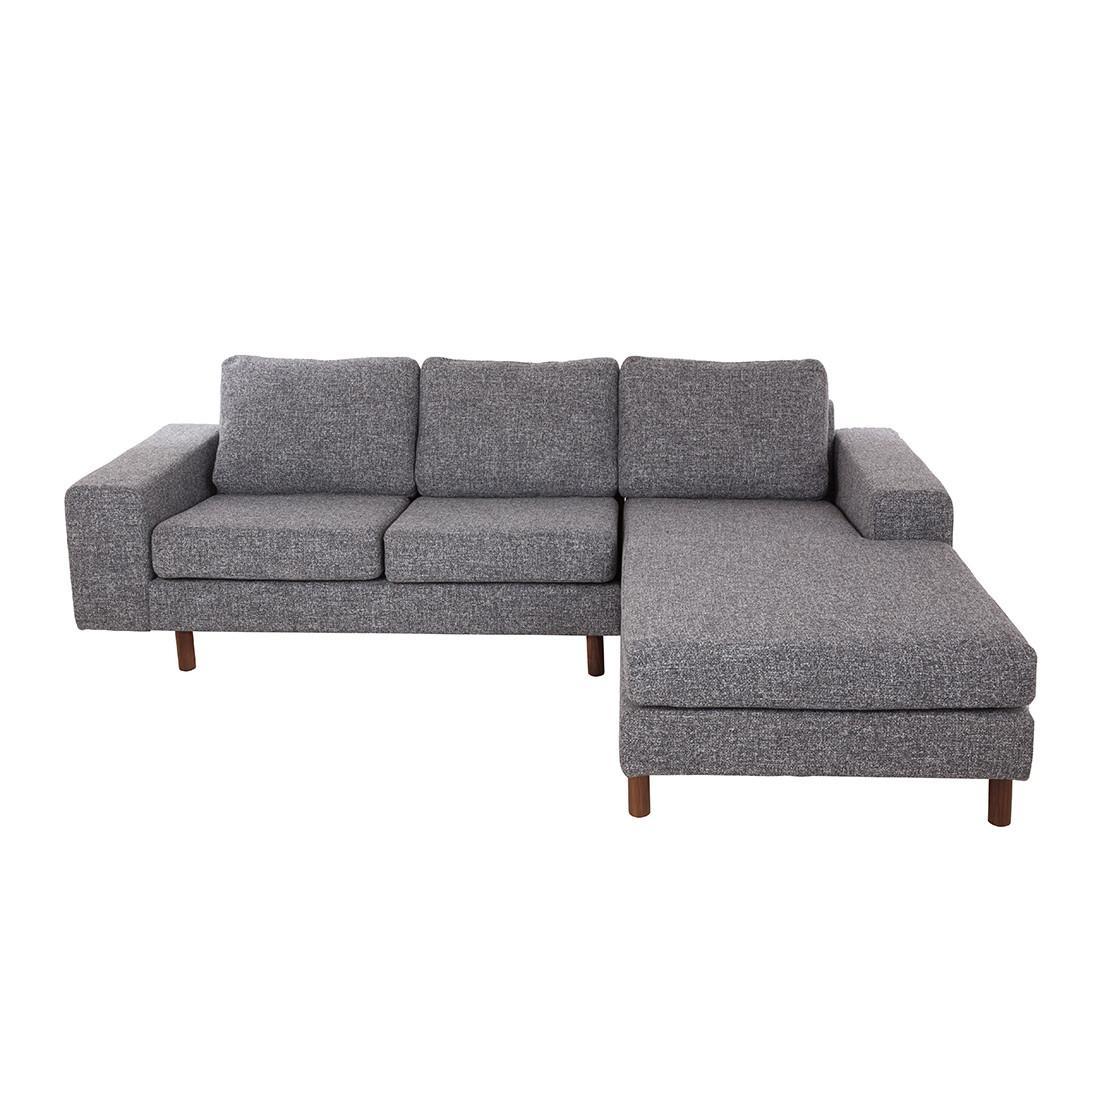 Sofas: Mid Century Settee | Mid Century Sofas | Cheap Mid Century In Cheap Retro Sofas (Image 8 of 20)